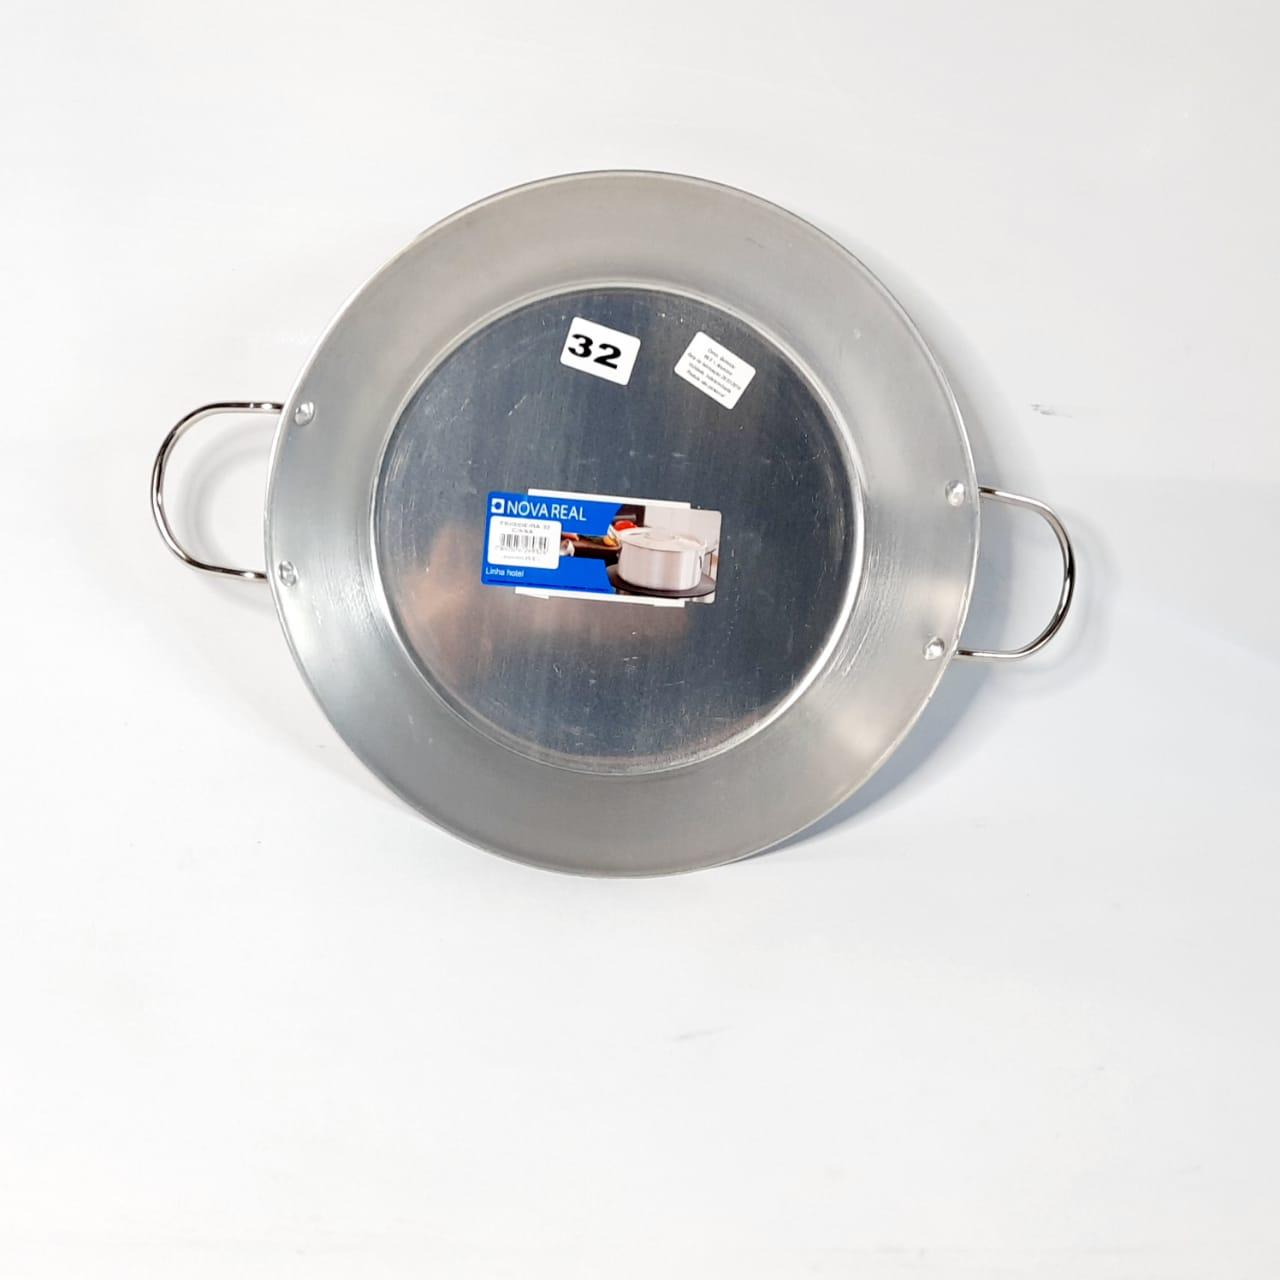 Frigideira Alumínio N 32 C/ASA Real